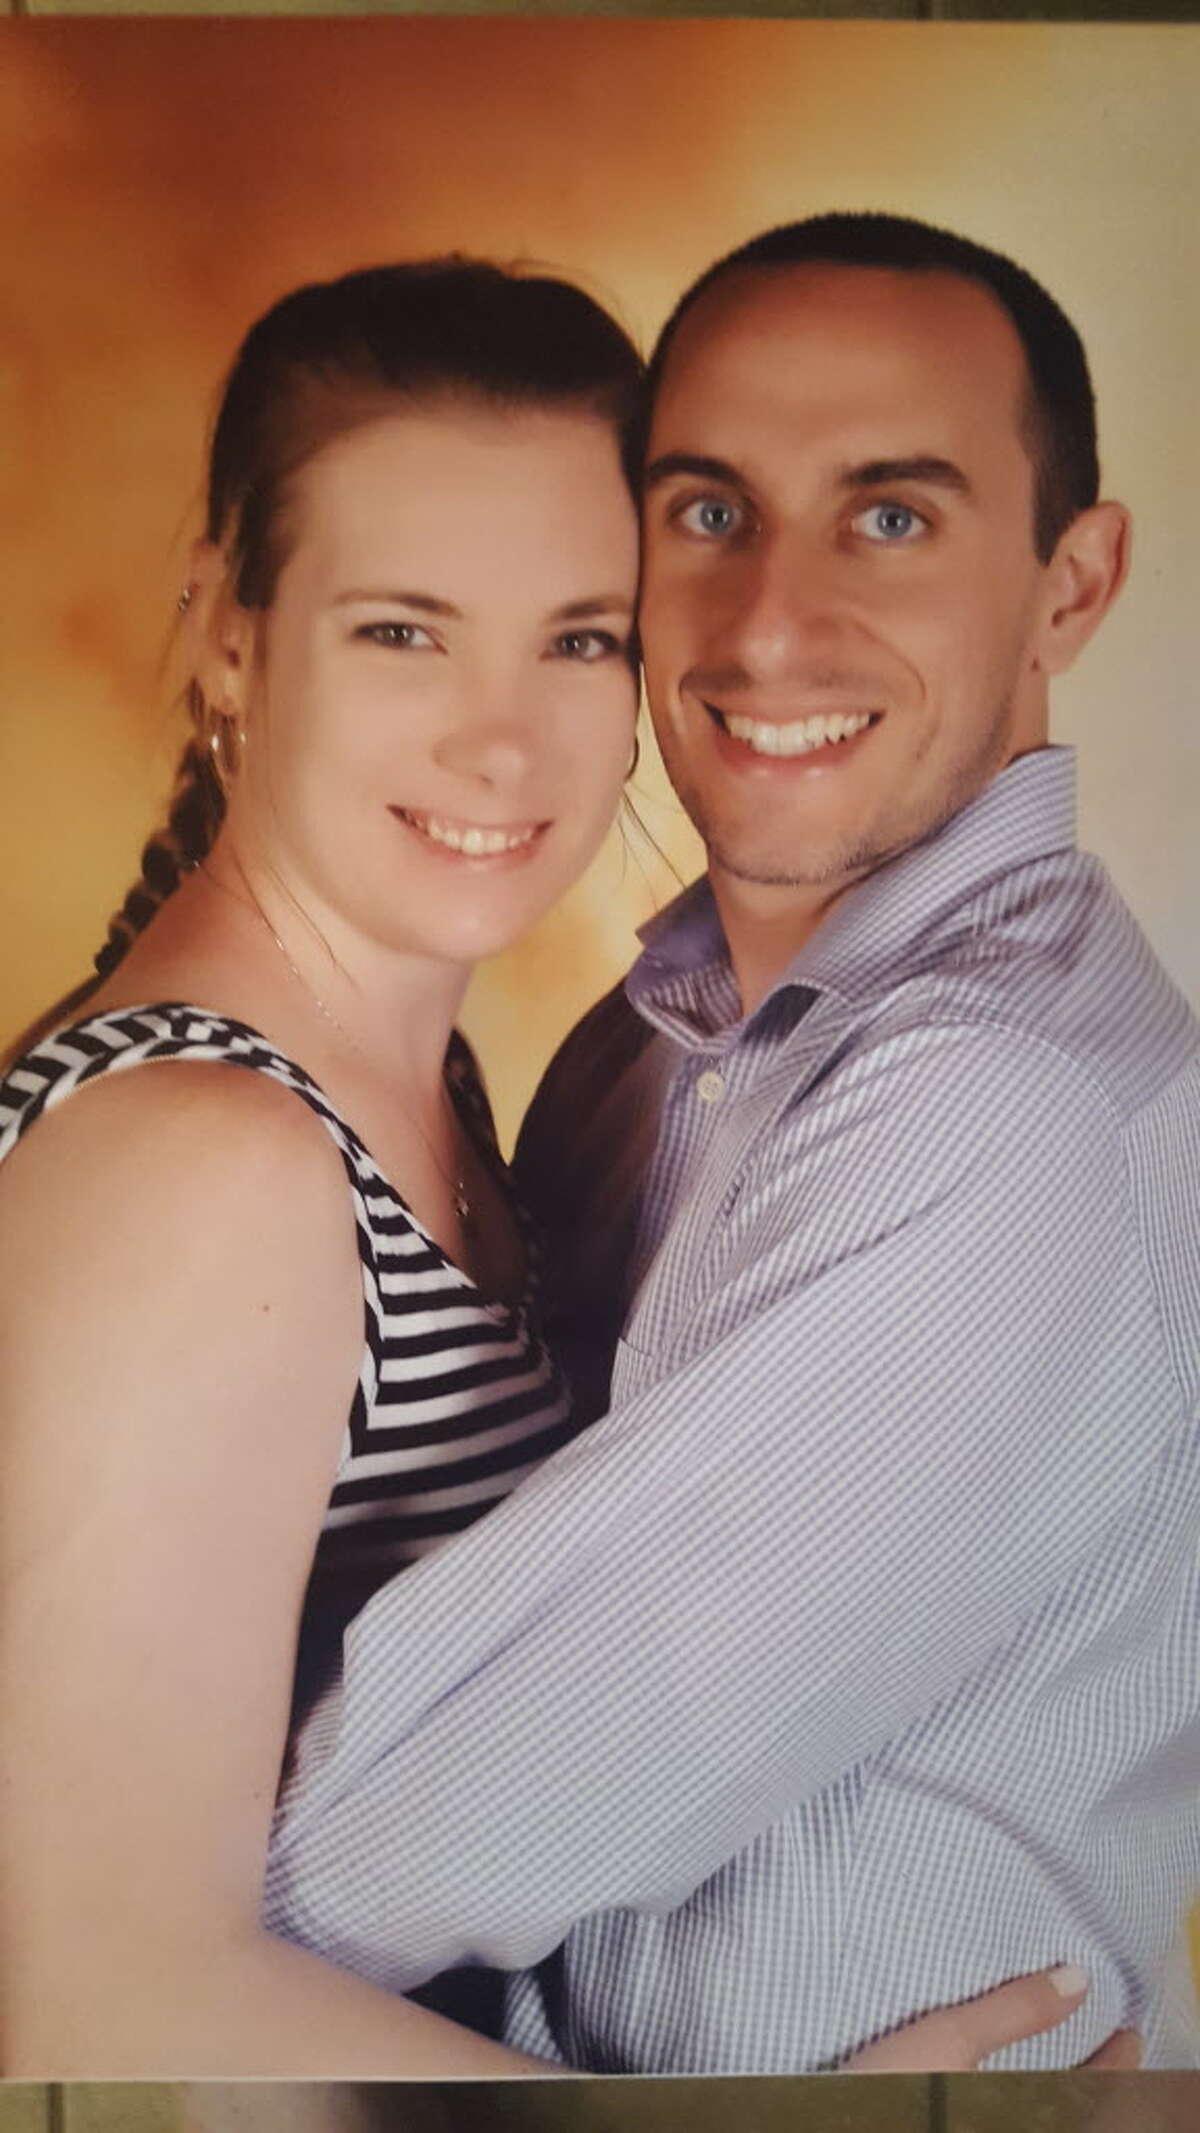 Susan Pittman and DanDan Zaksheske were forced to postpone their wedding after Hurricane Harvey crashed their plans.